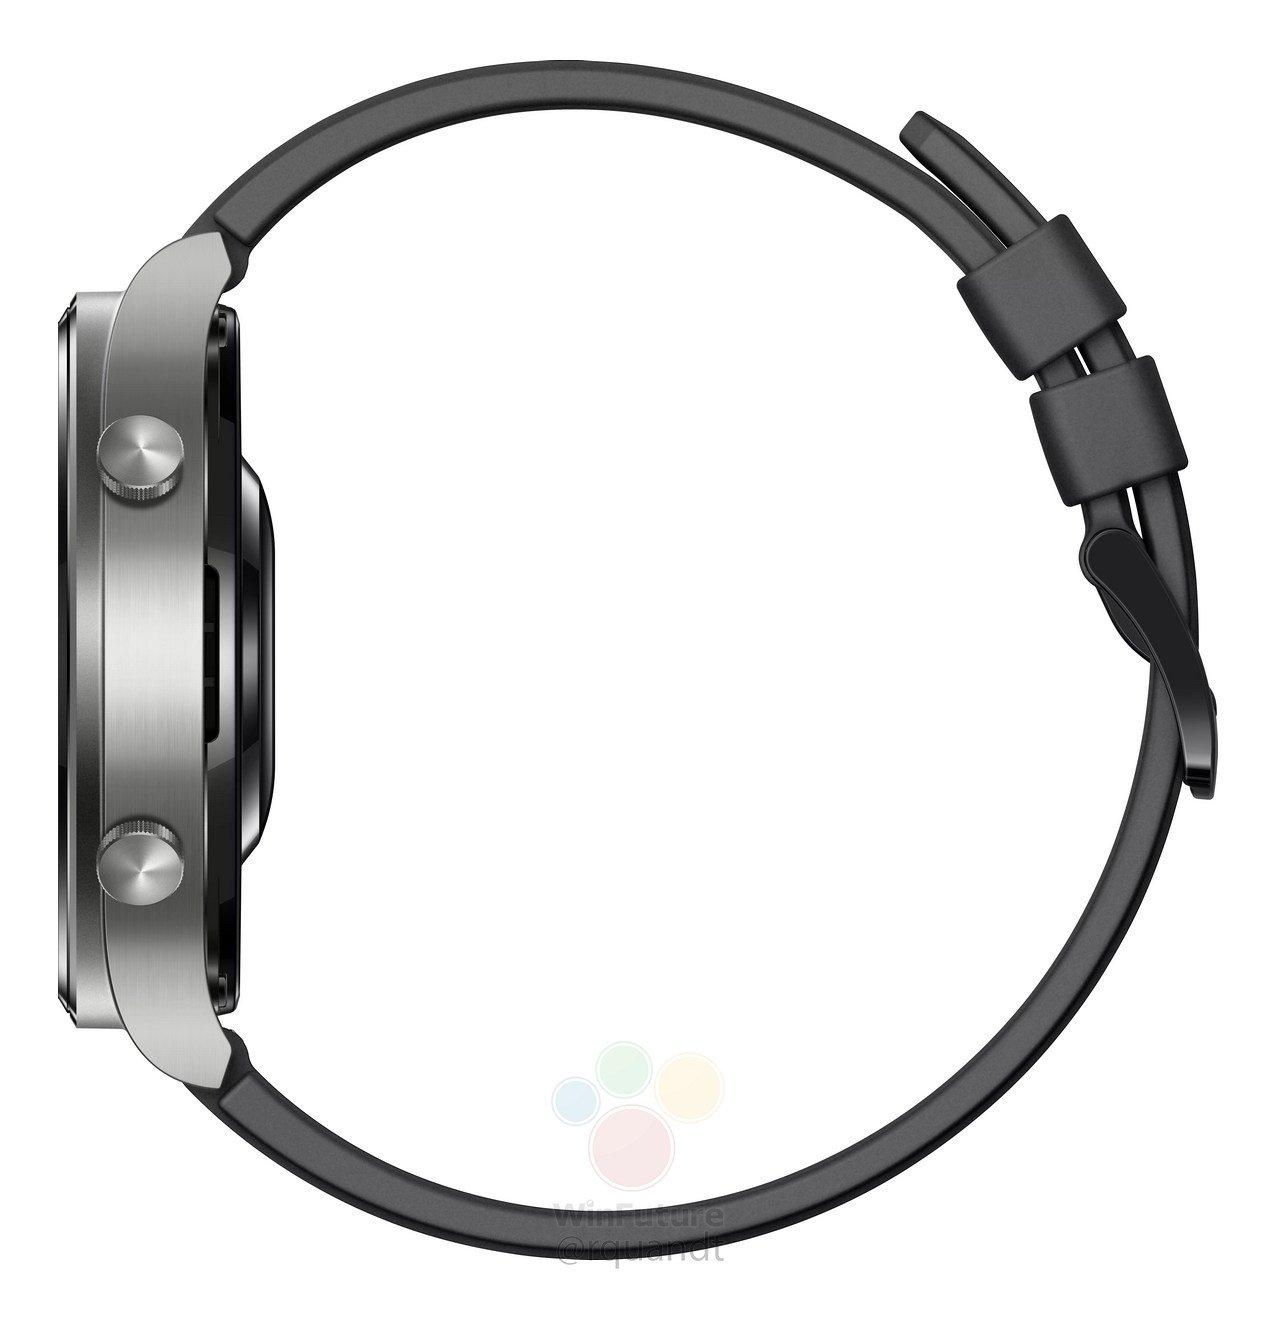 Huawei Watch GT2 Pro 1599138573 0 0 large